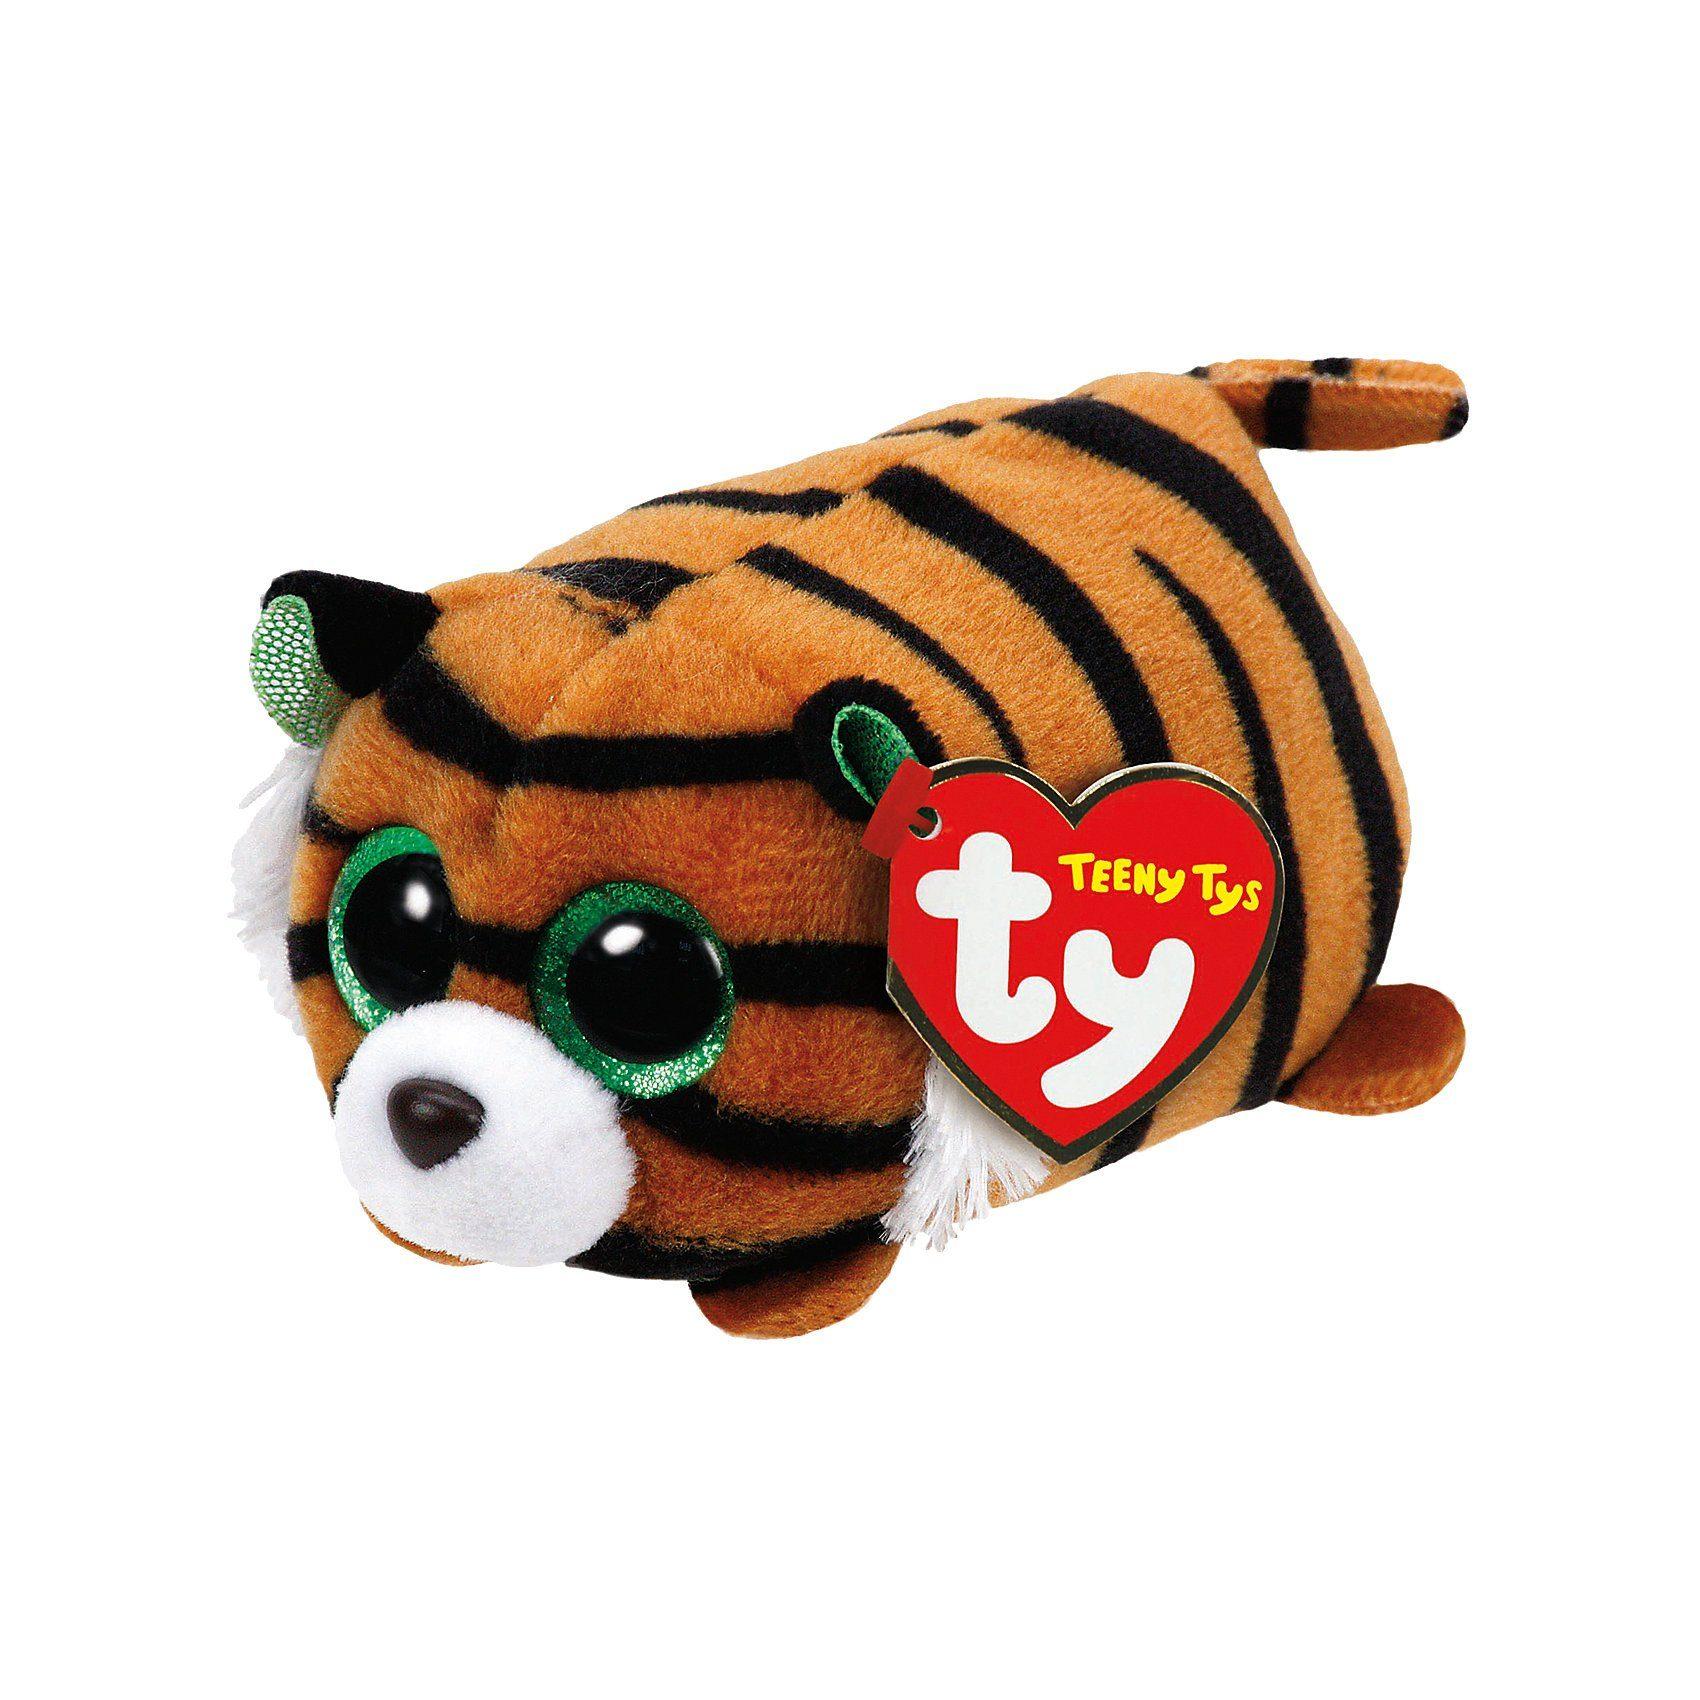 Ty® Teeny s Tiger Tiggy, 10cm